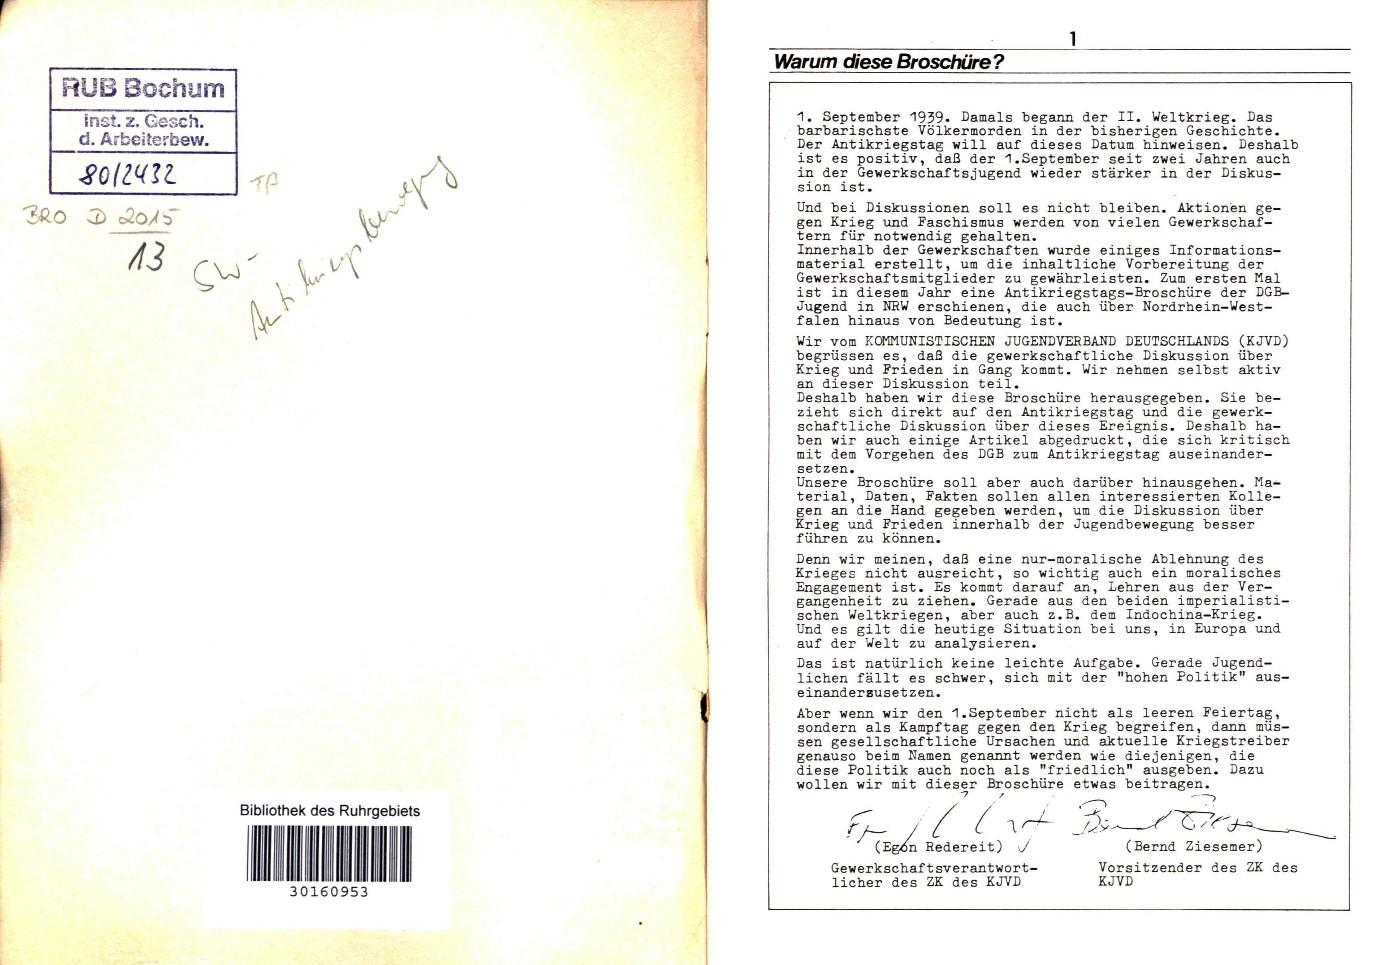 KJVD_1979_Dokumente_zum_Antikriegstag_02